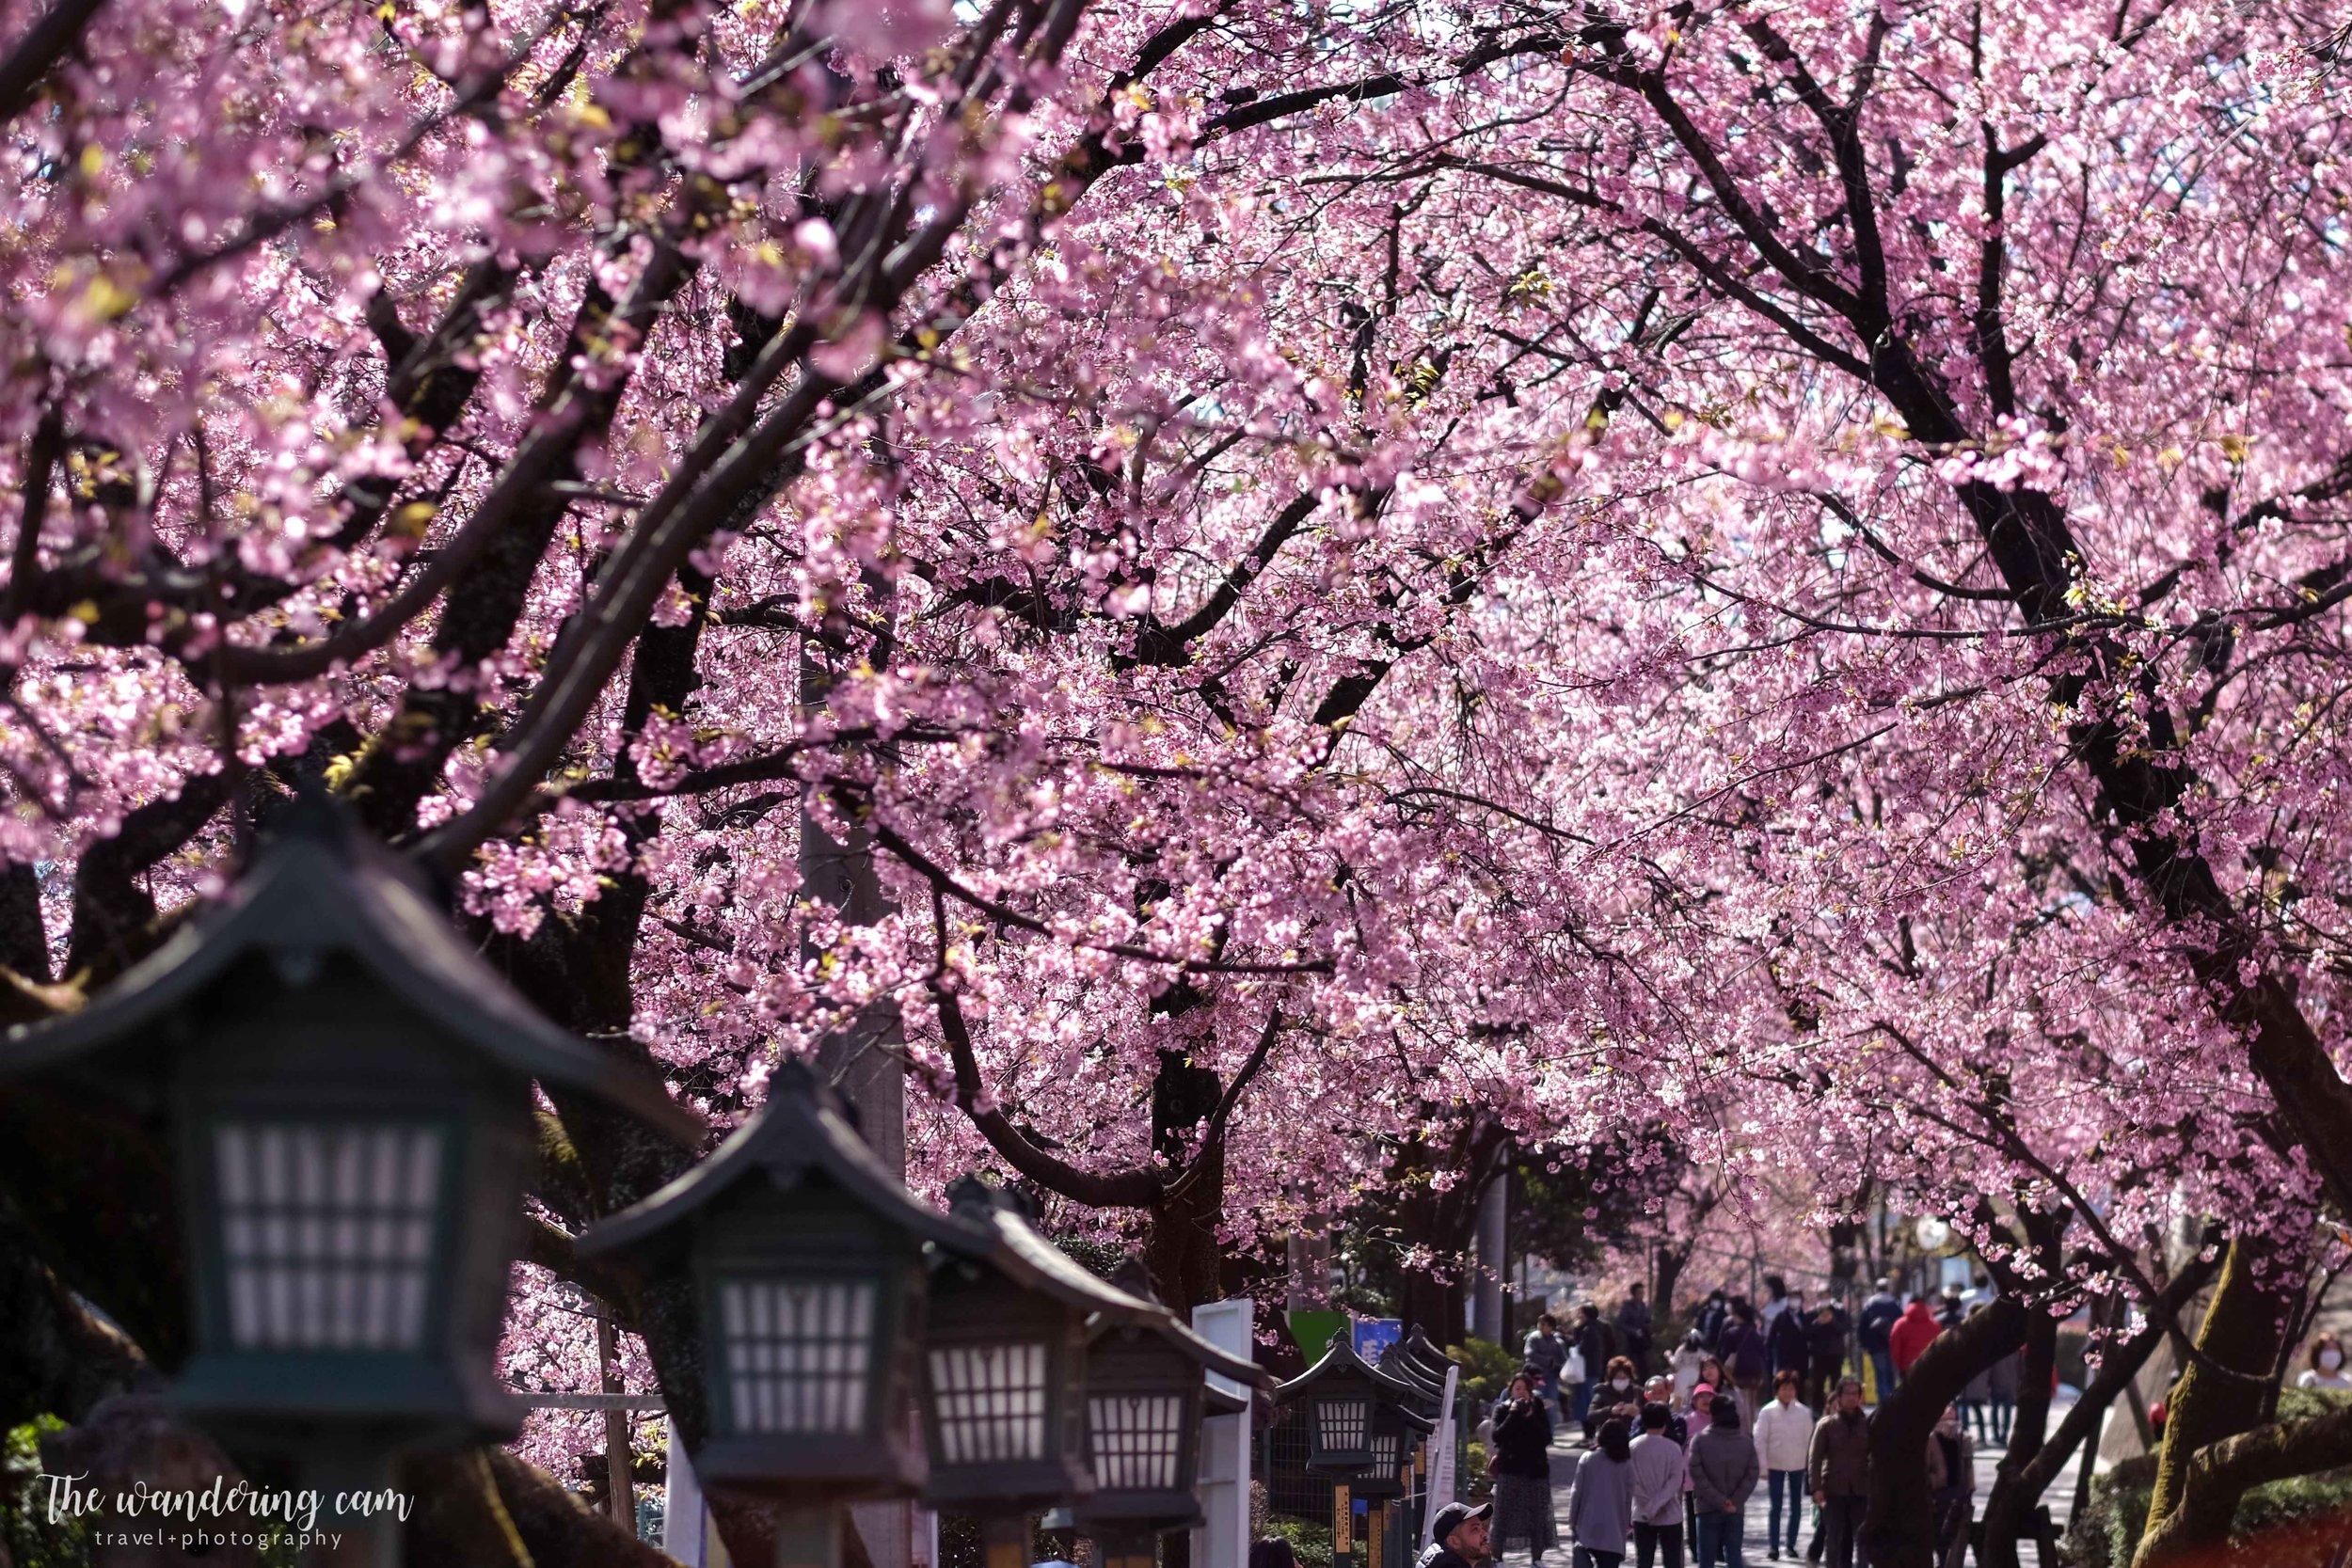 thewanderingcam_sakura_mitsuzoin-4481.jpg